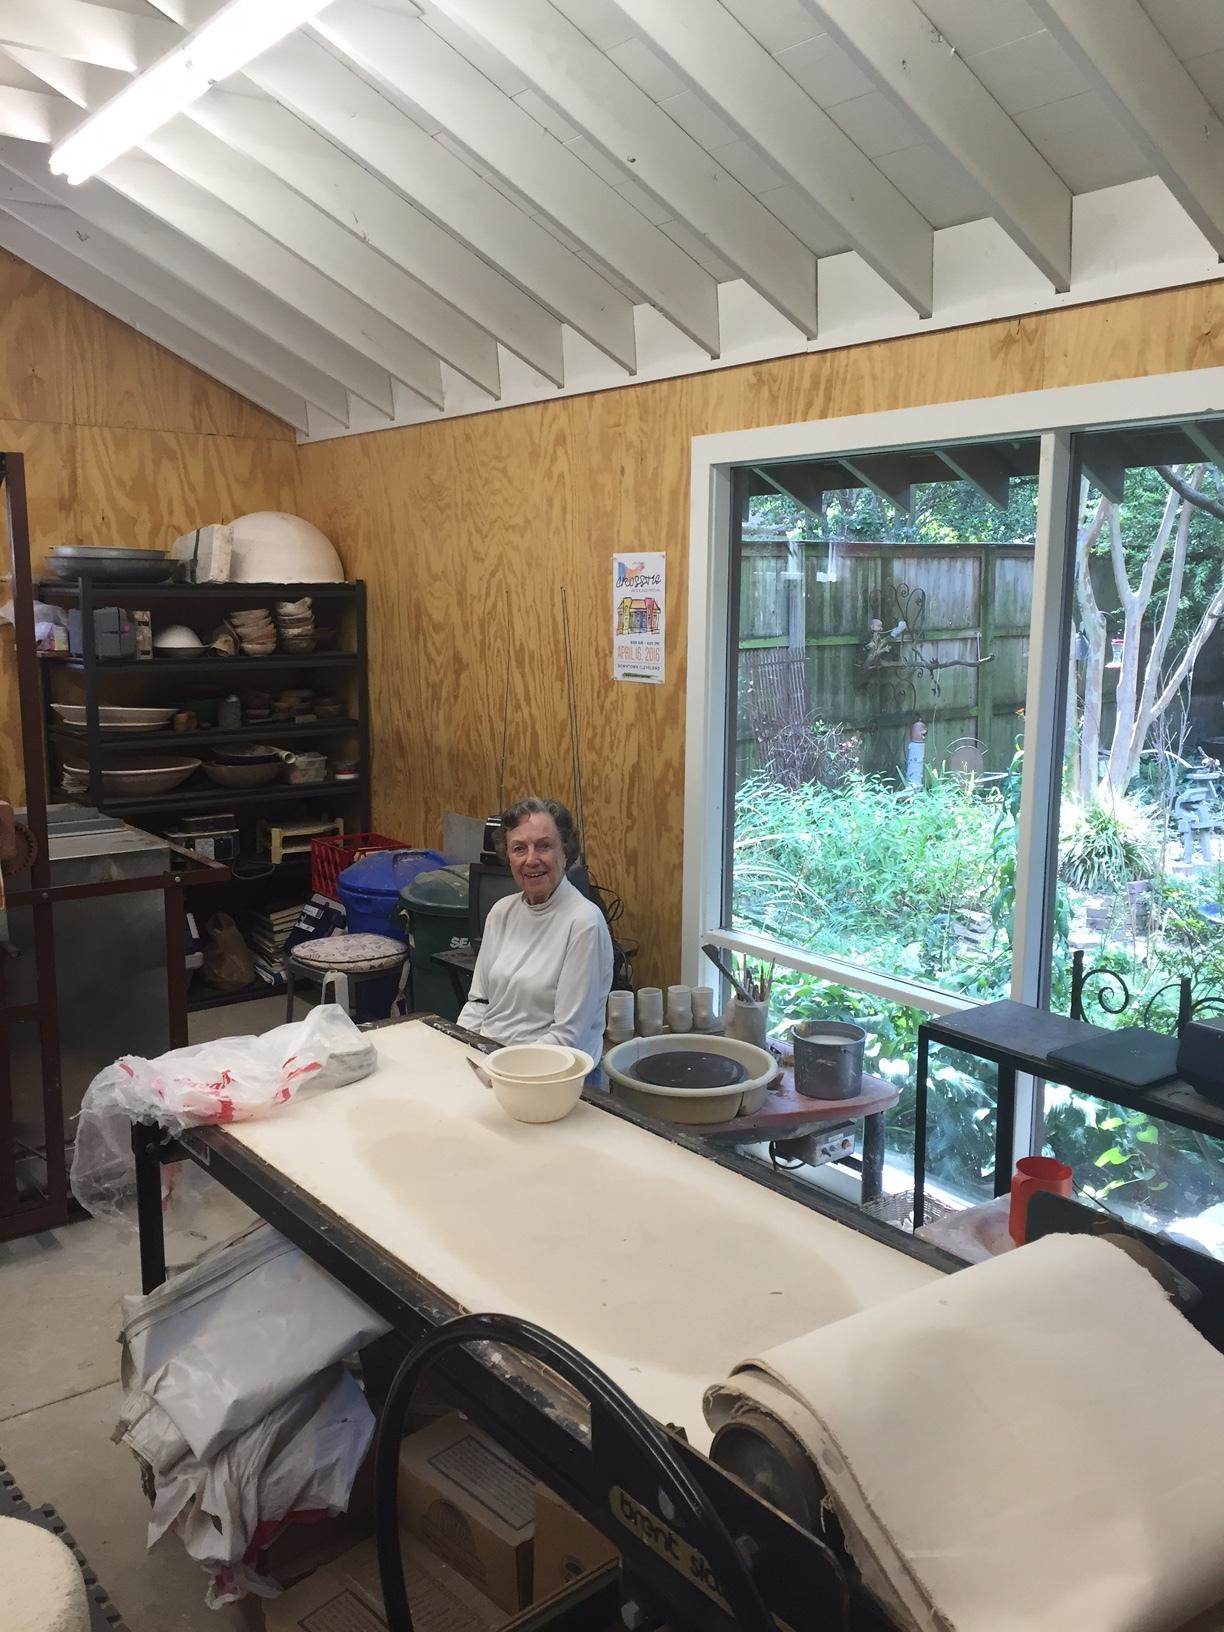 Mimi Dann, Artist in Residence for the day at the new Katie Dann Ceramic Studio.